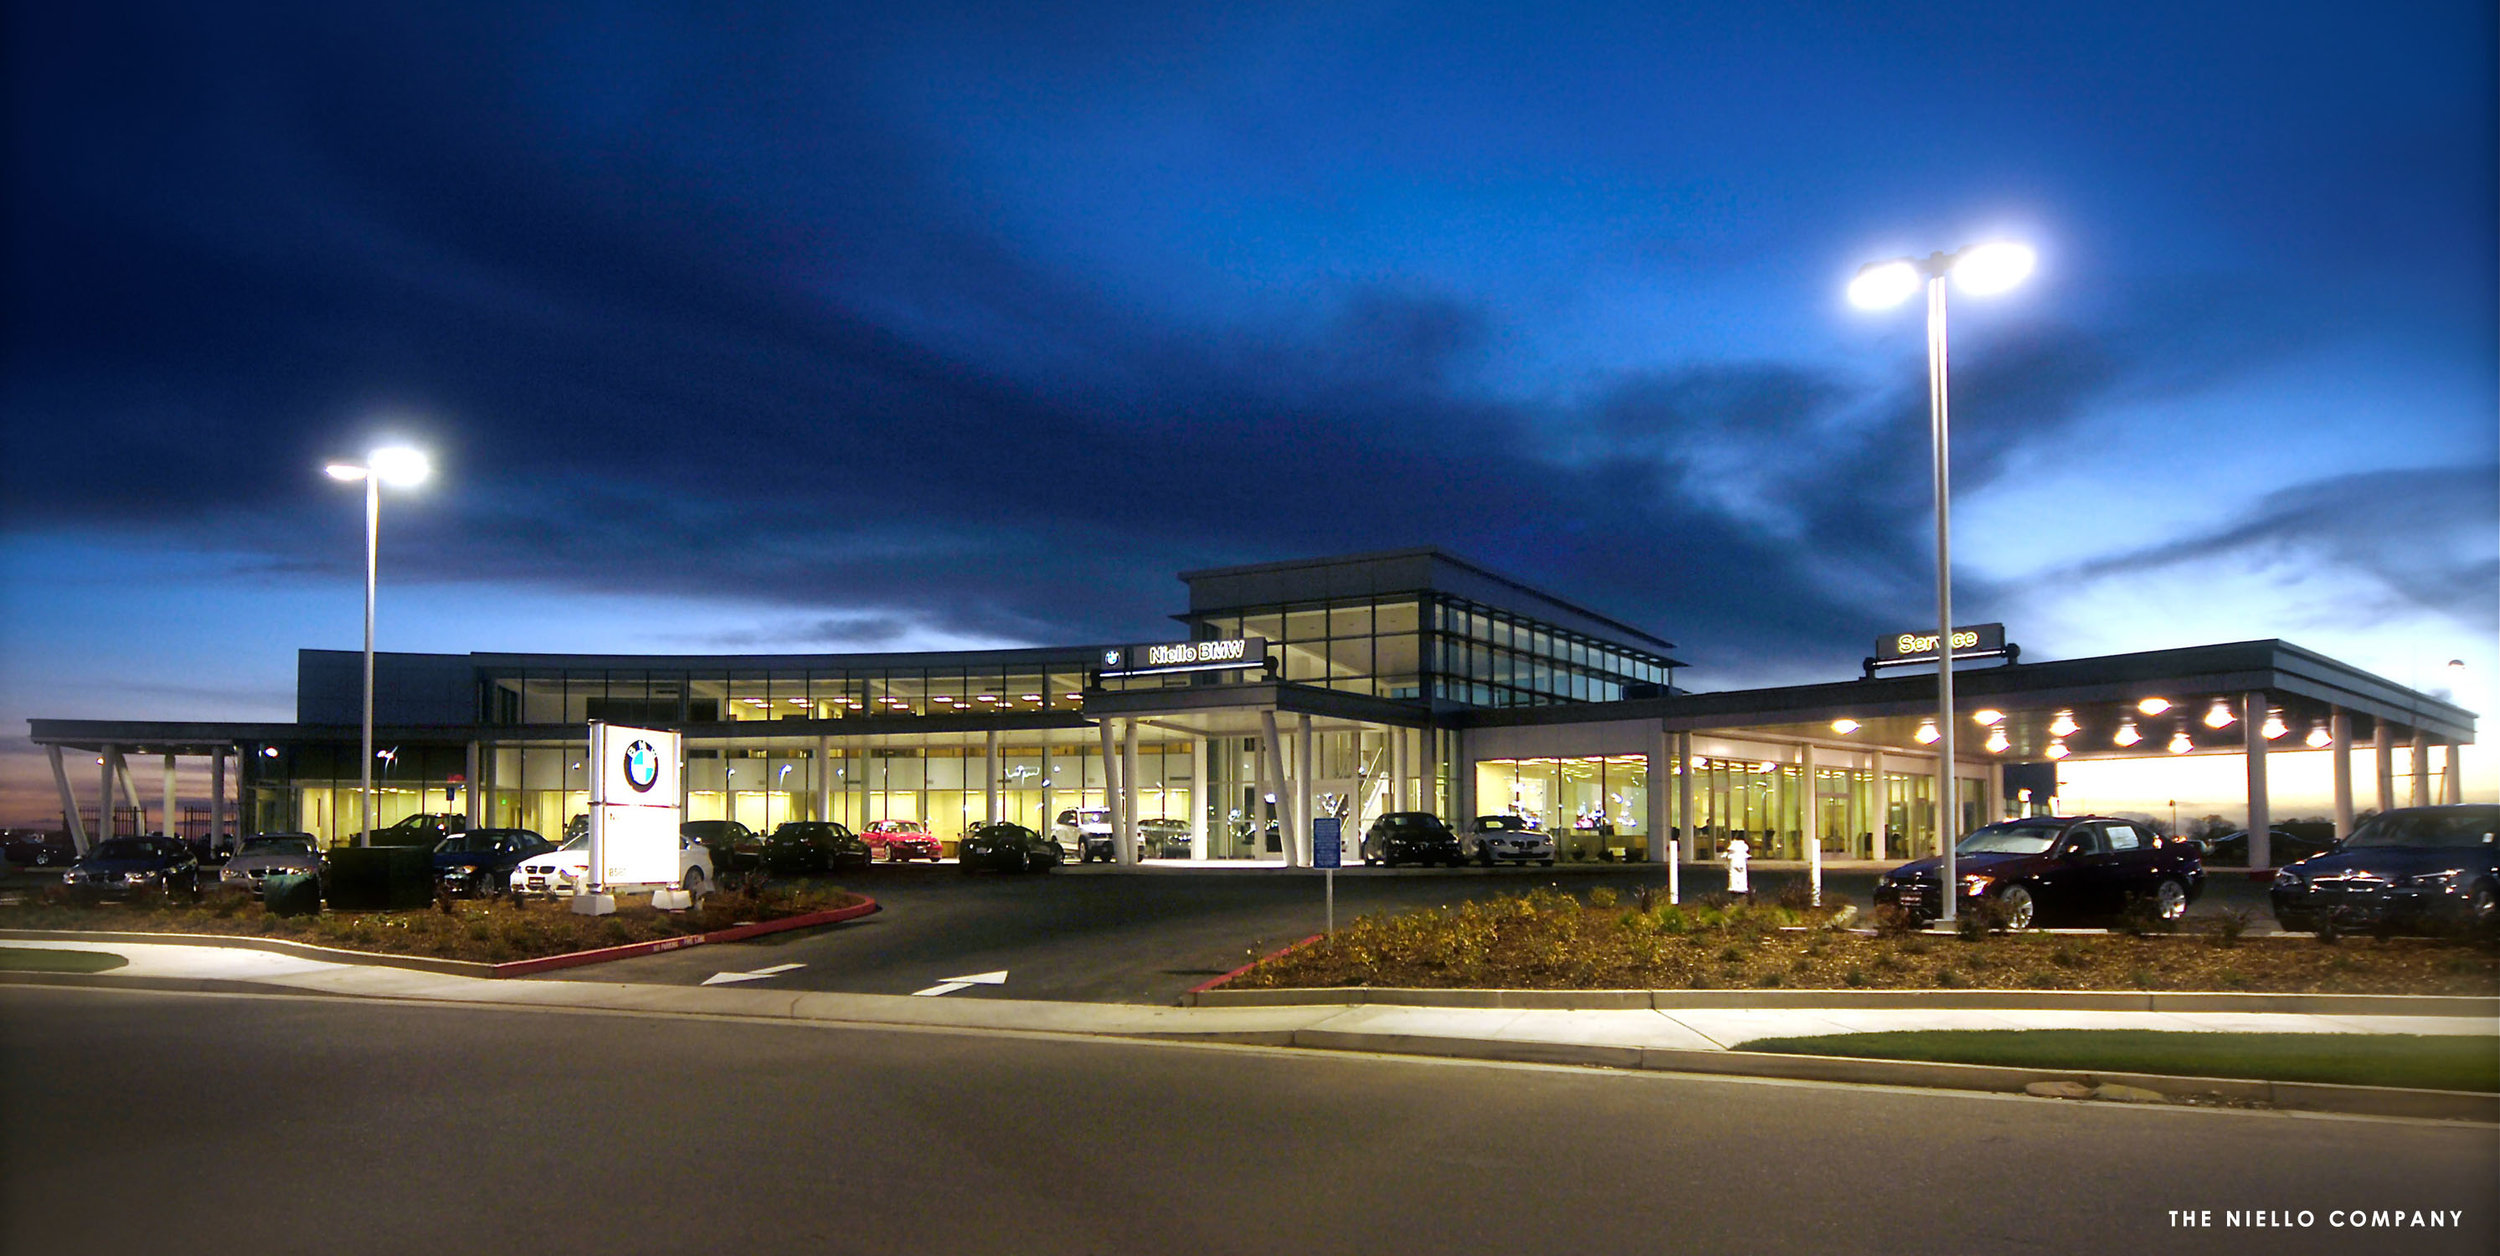 BMW - ELK GROVE, CA